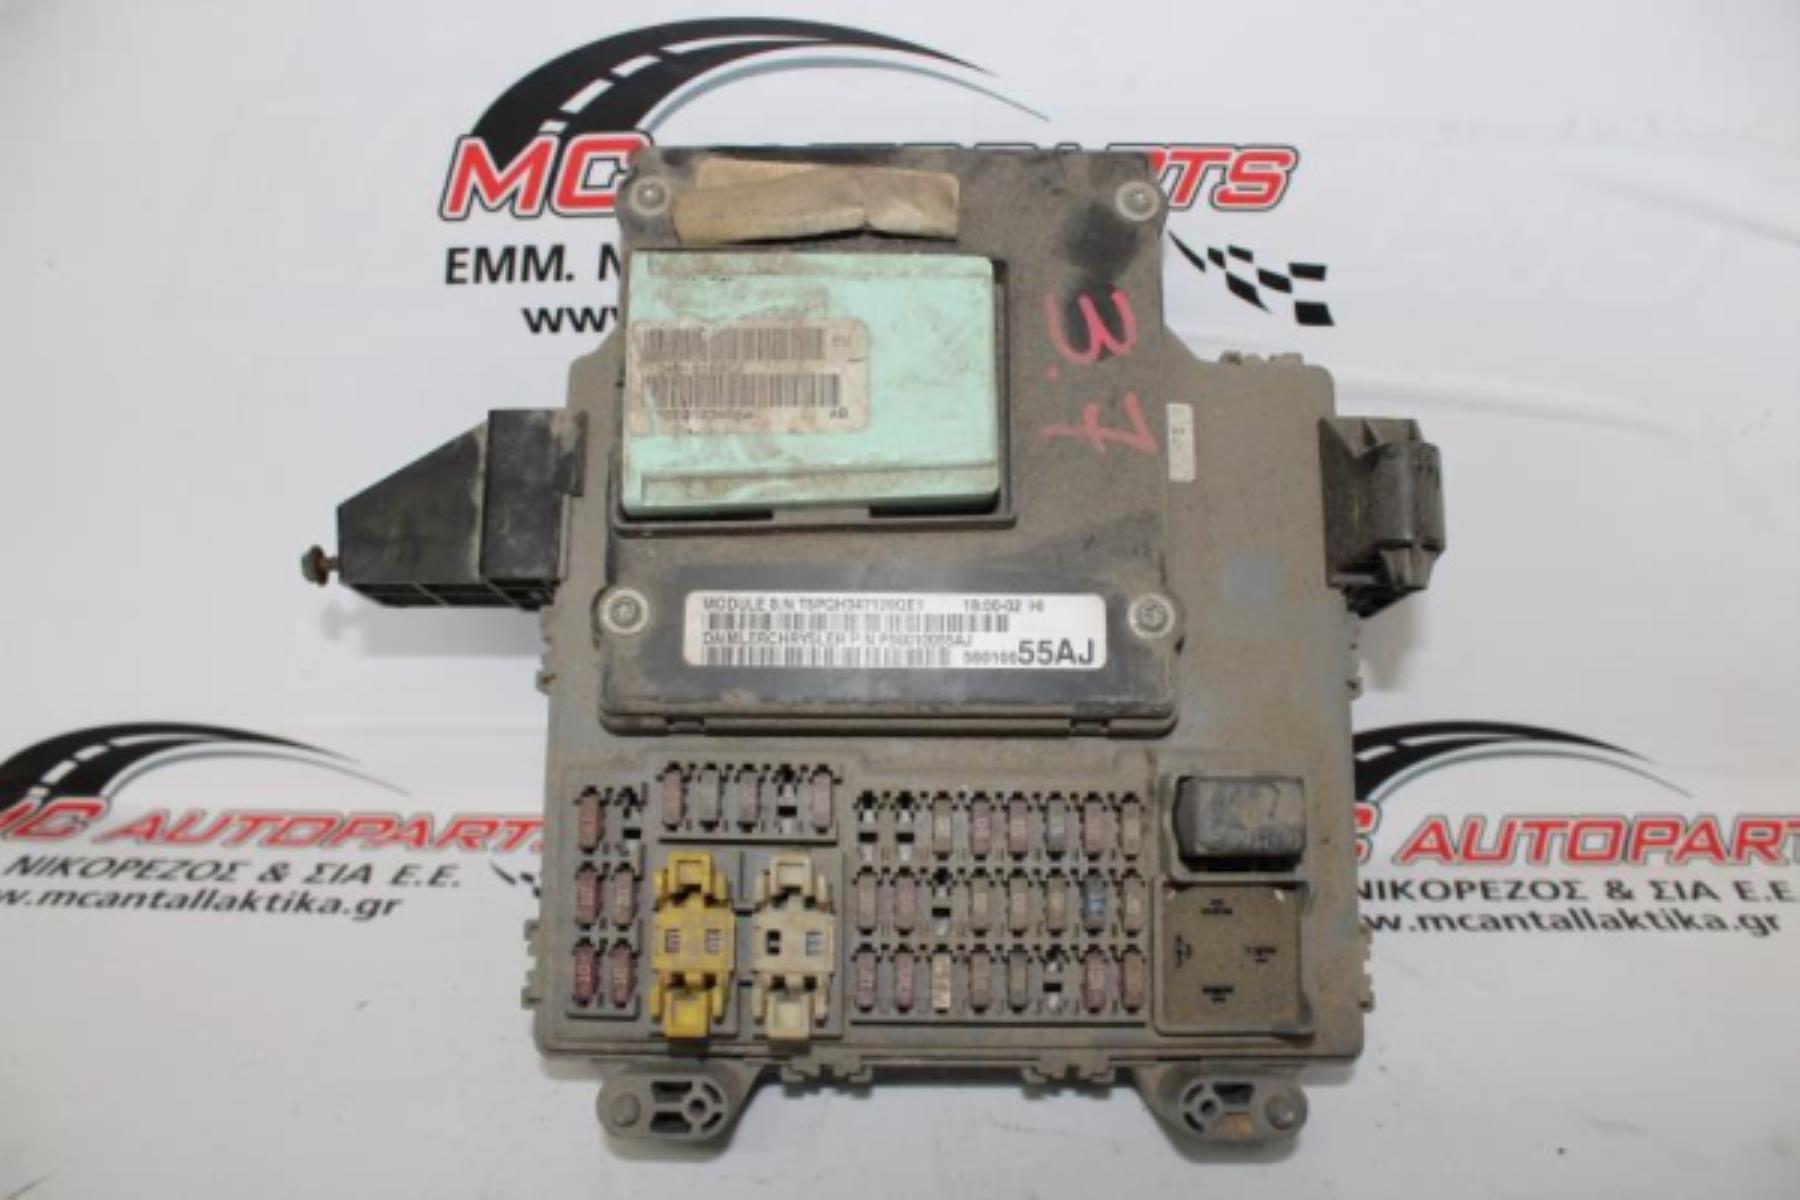 Picture of Ασφαλειοθήκη  JEEP CHEROKEE (2002-2008) 3700cc P56010055AJ   μέσα